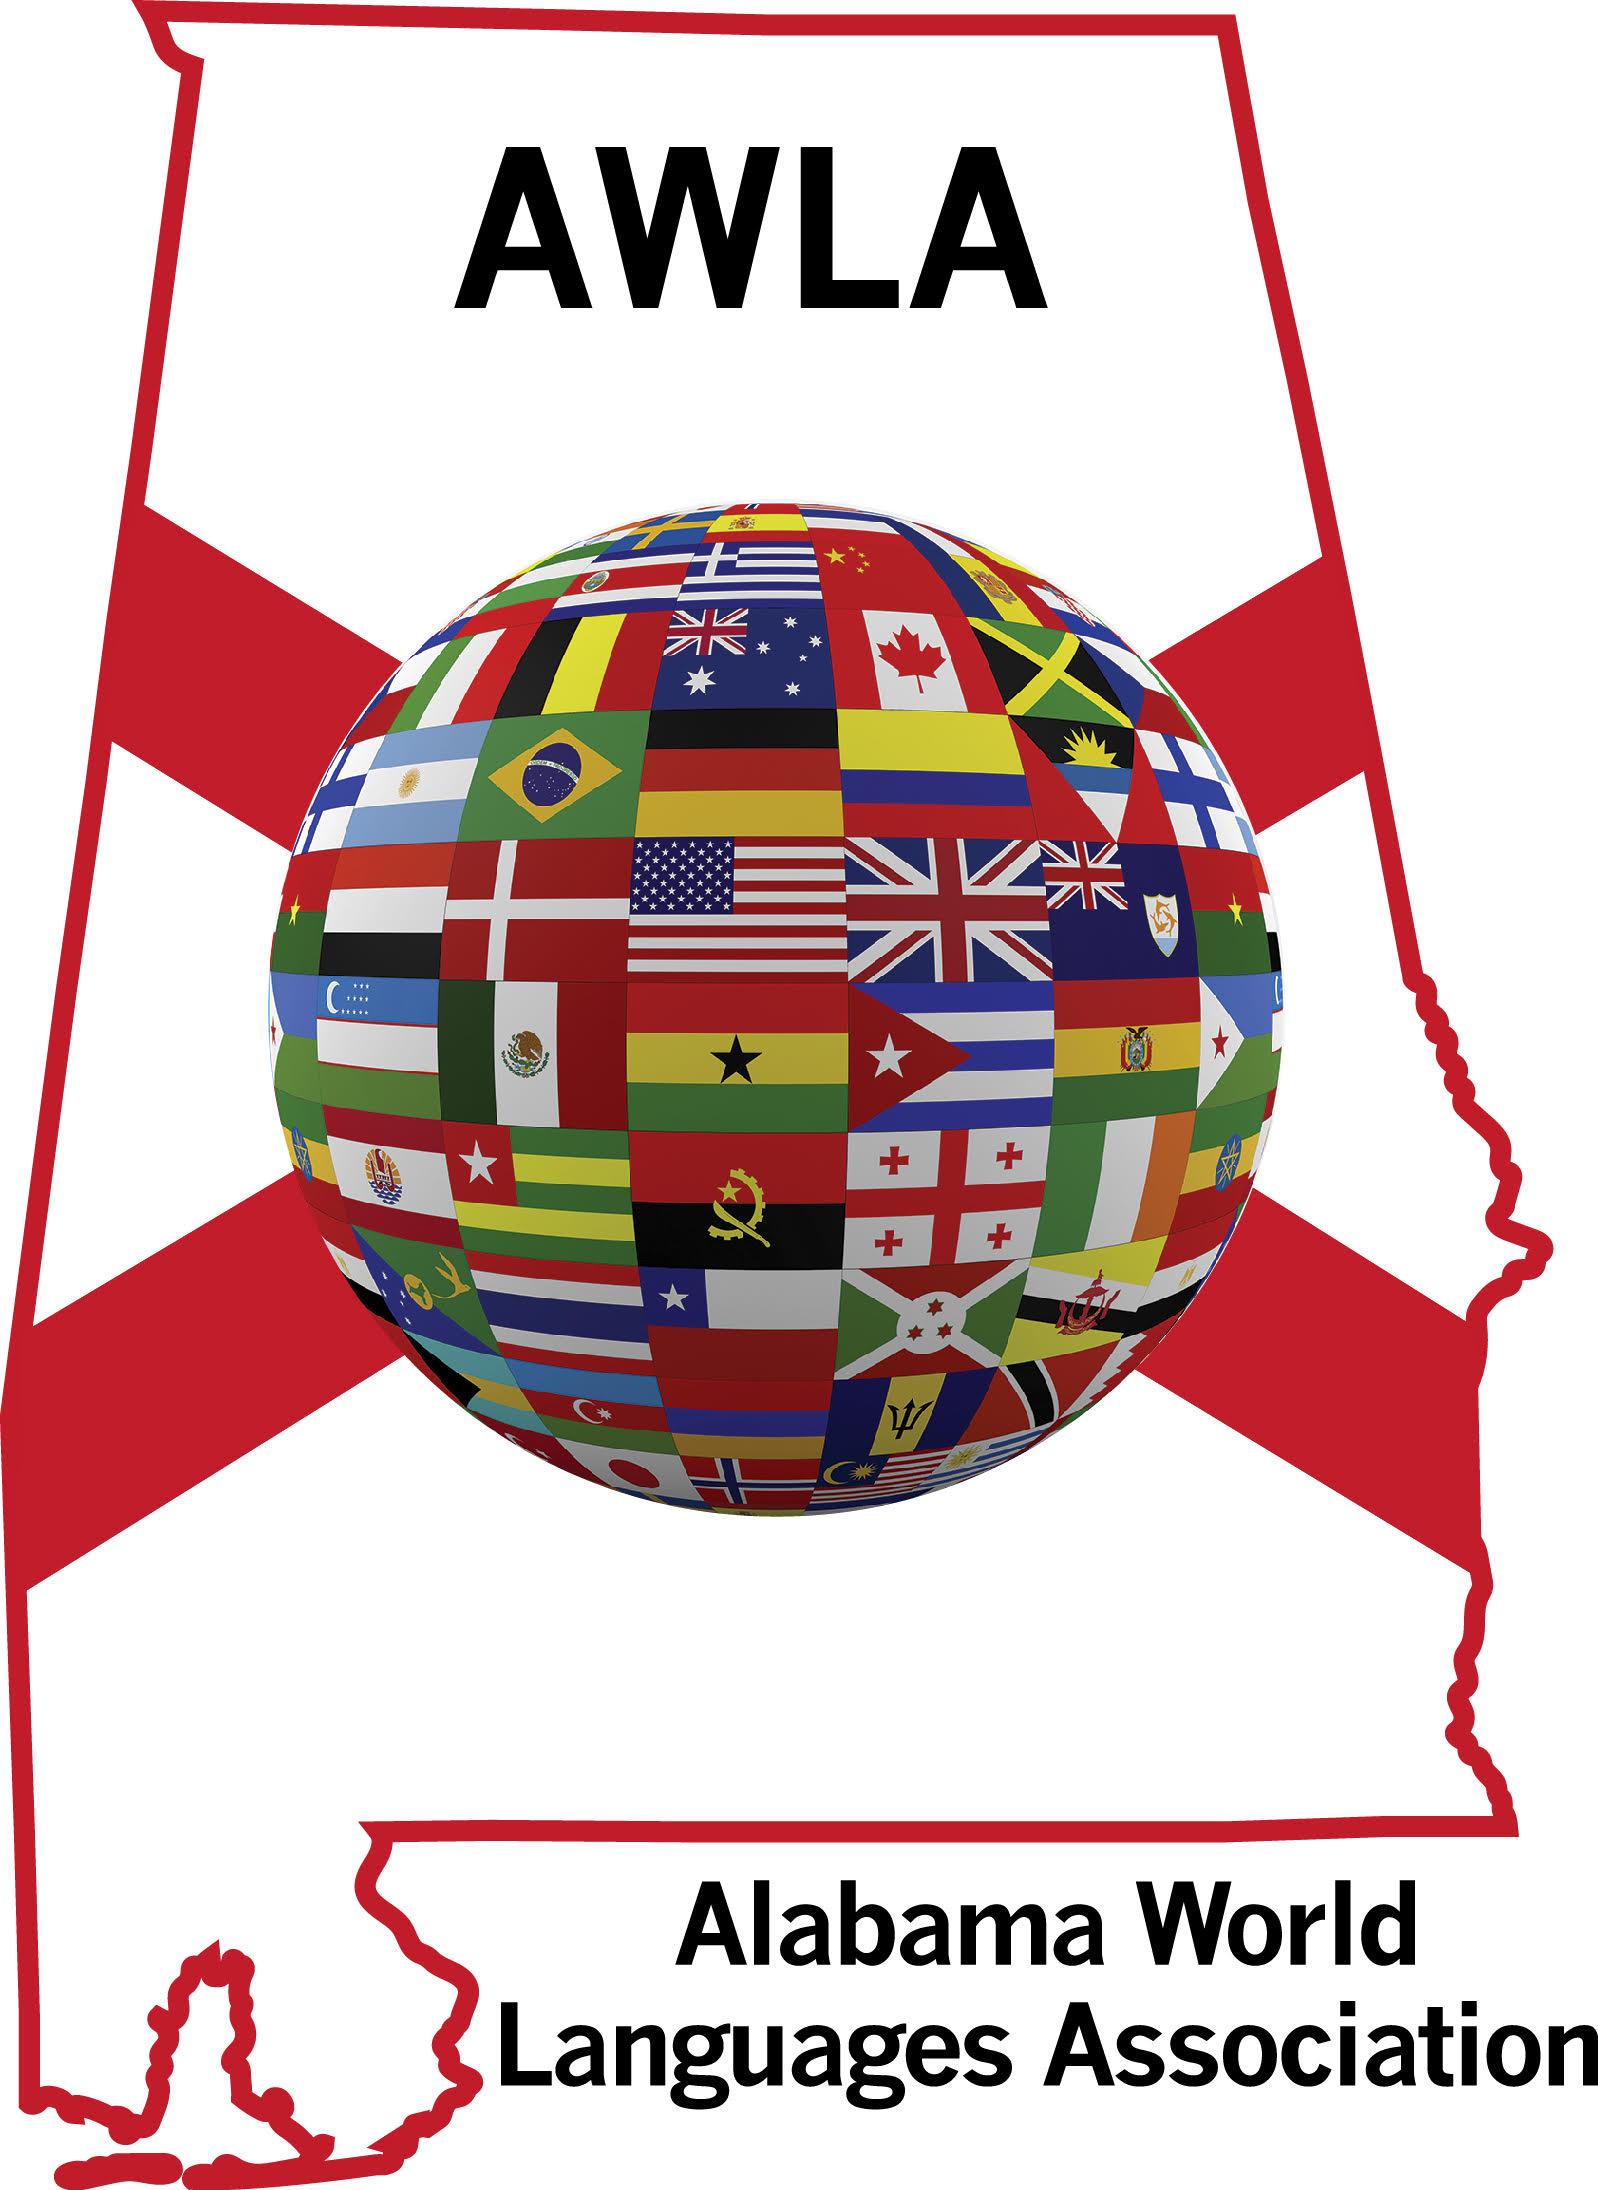 Alabama World Languages Association    theawla@gmail.com